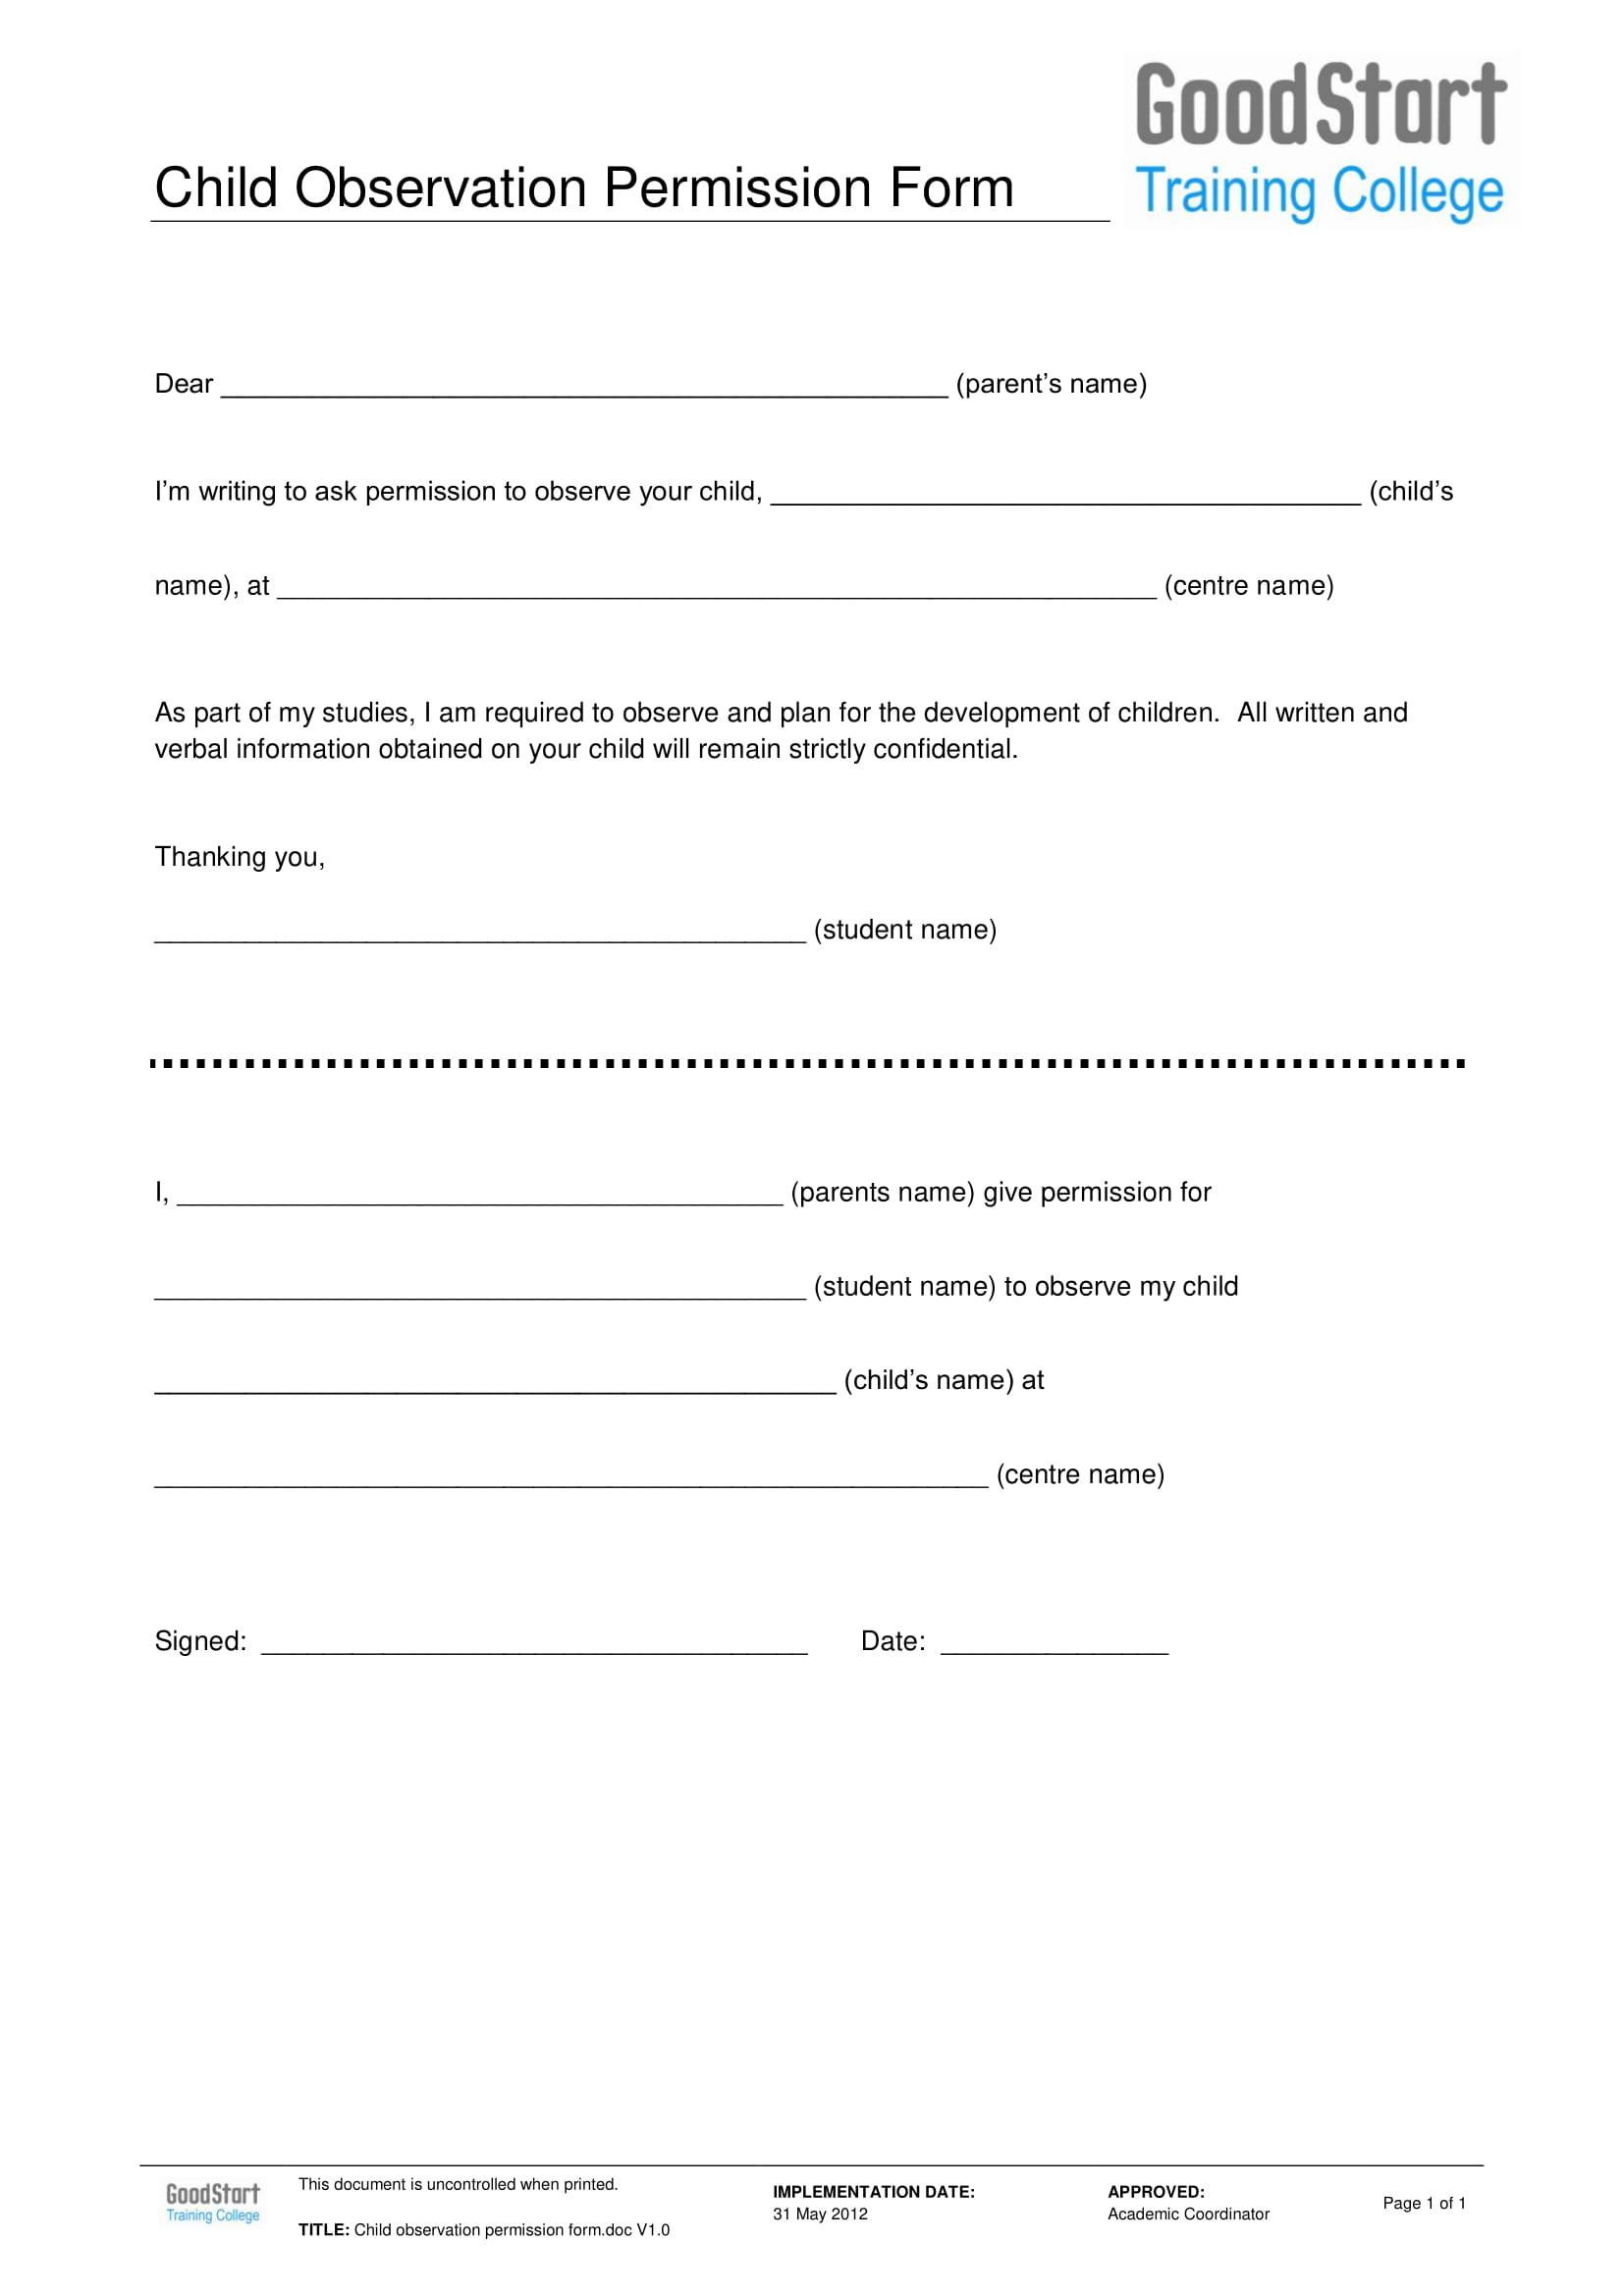 child observation permission form 1